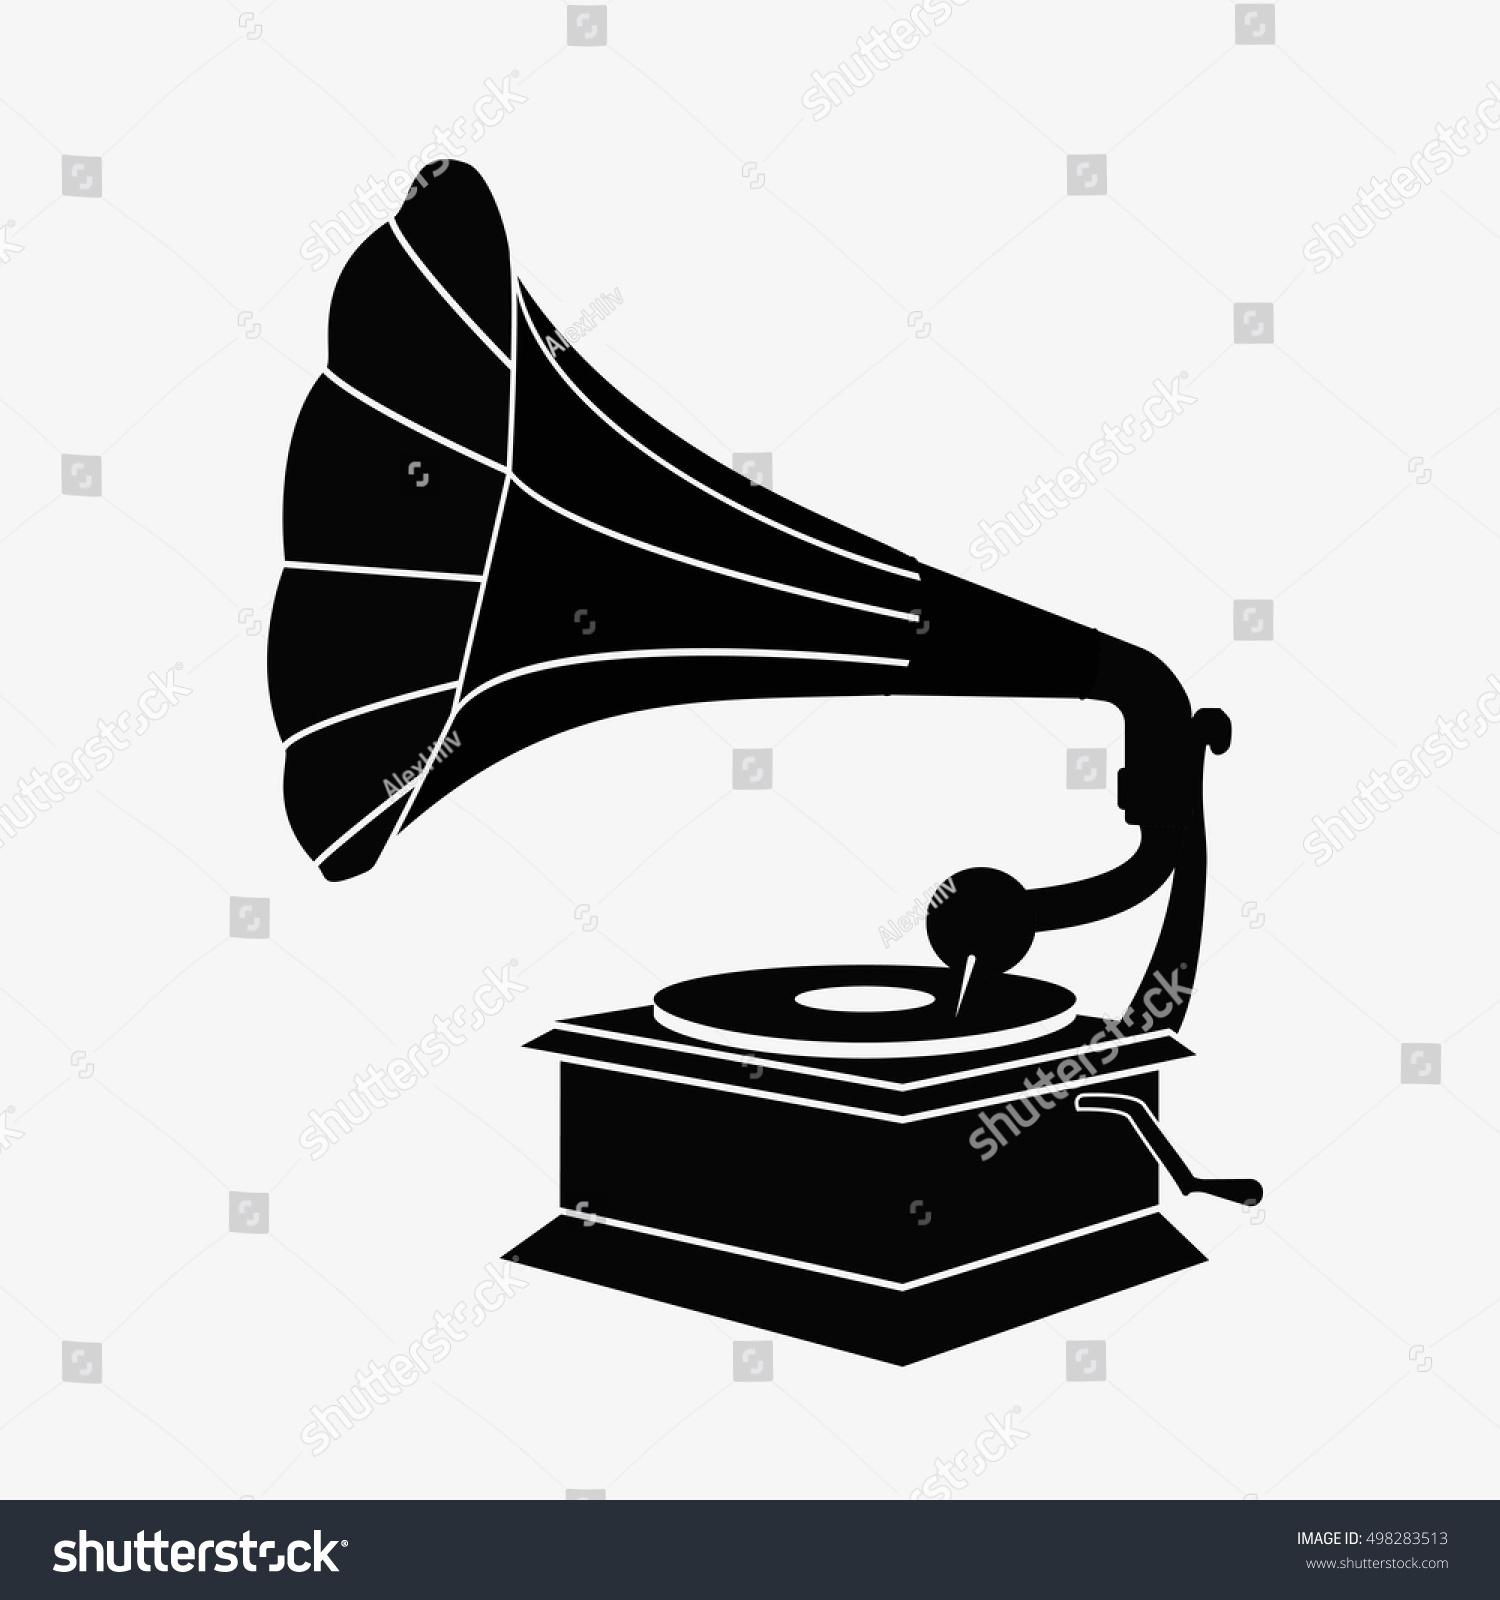 old gramophone silhouette flat vector stock stock vector royalty free 498283513 https www shutterstock com image vector old gramophone silhouette flat vector stock 498283513